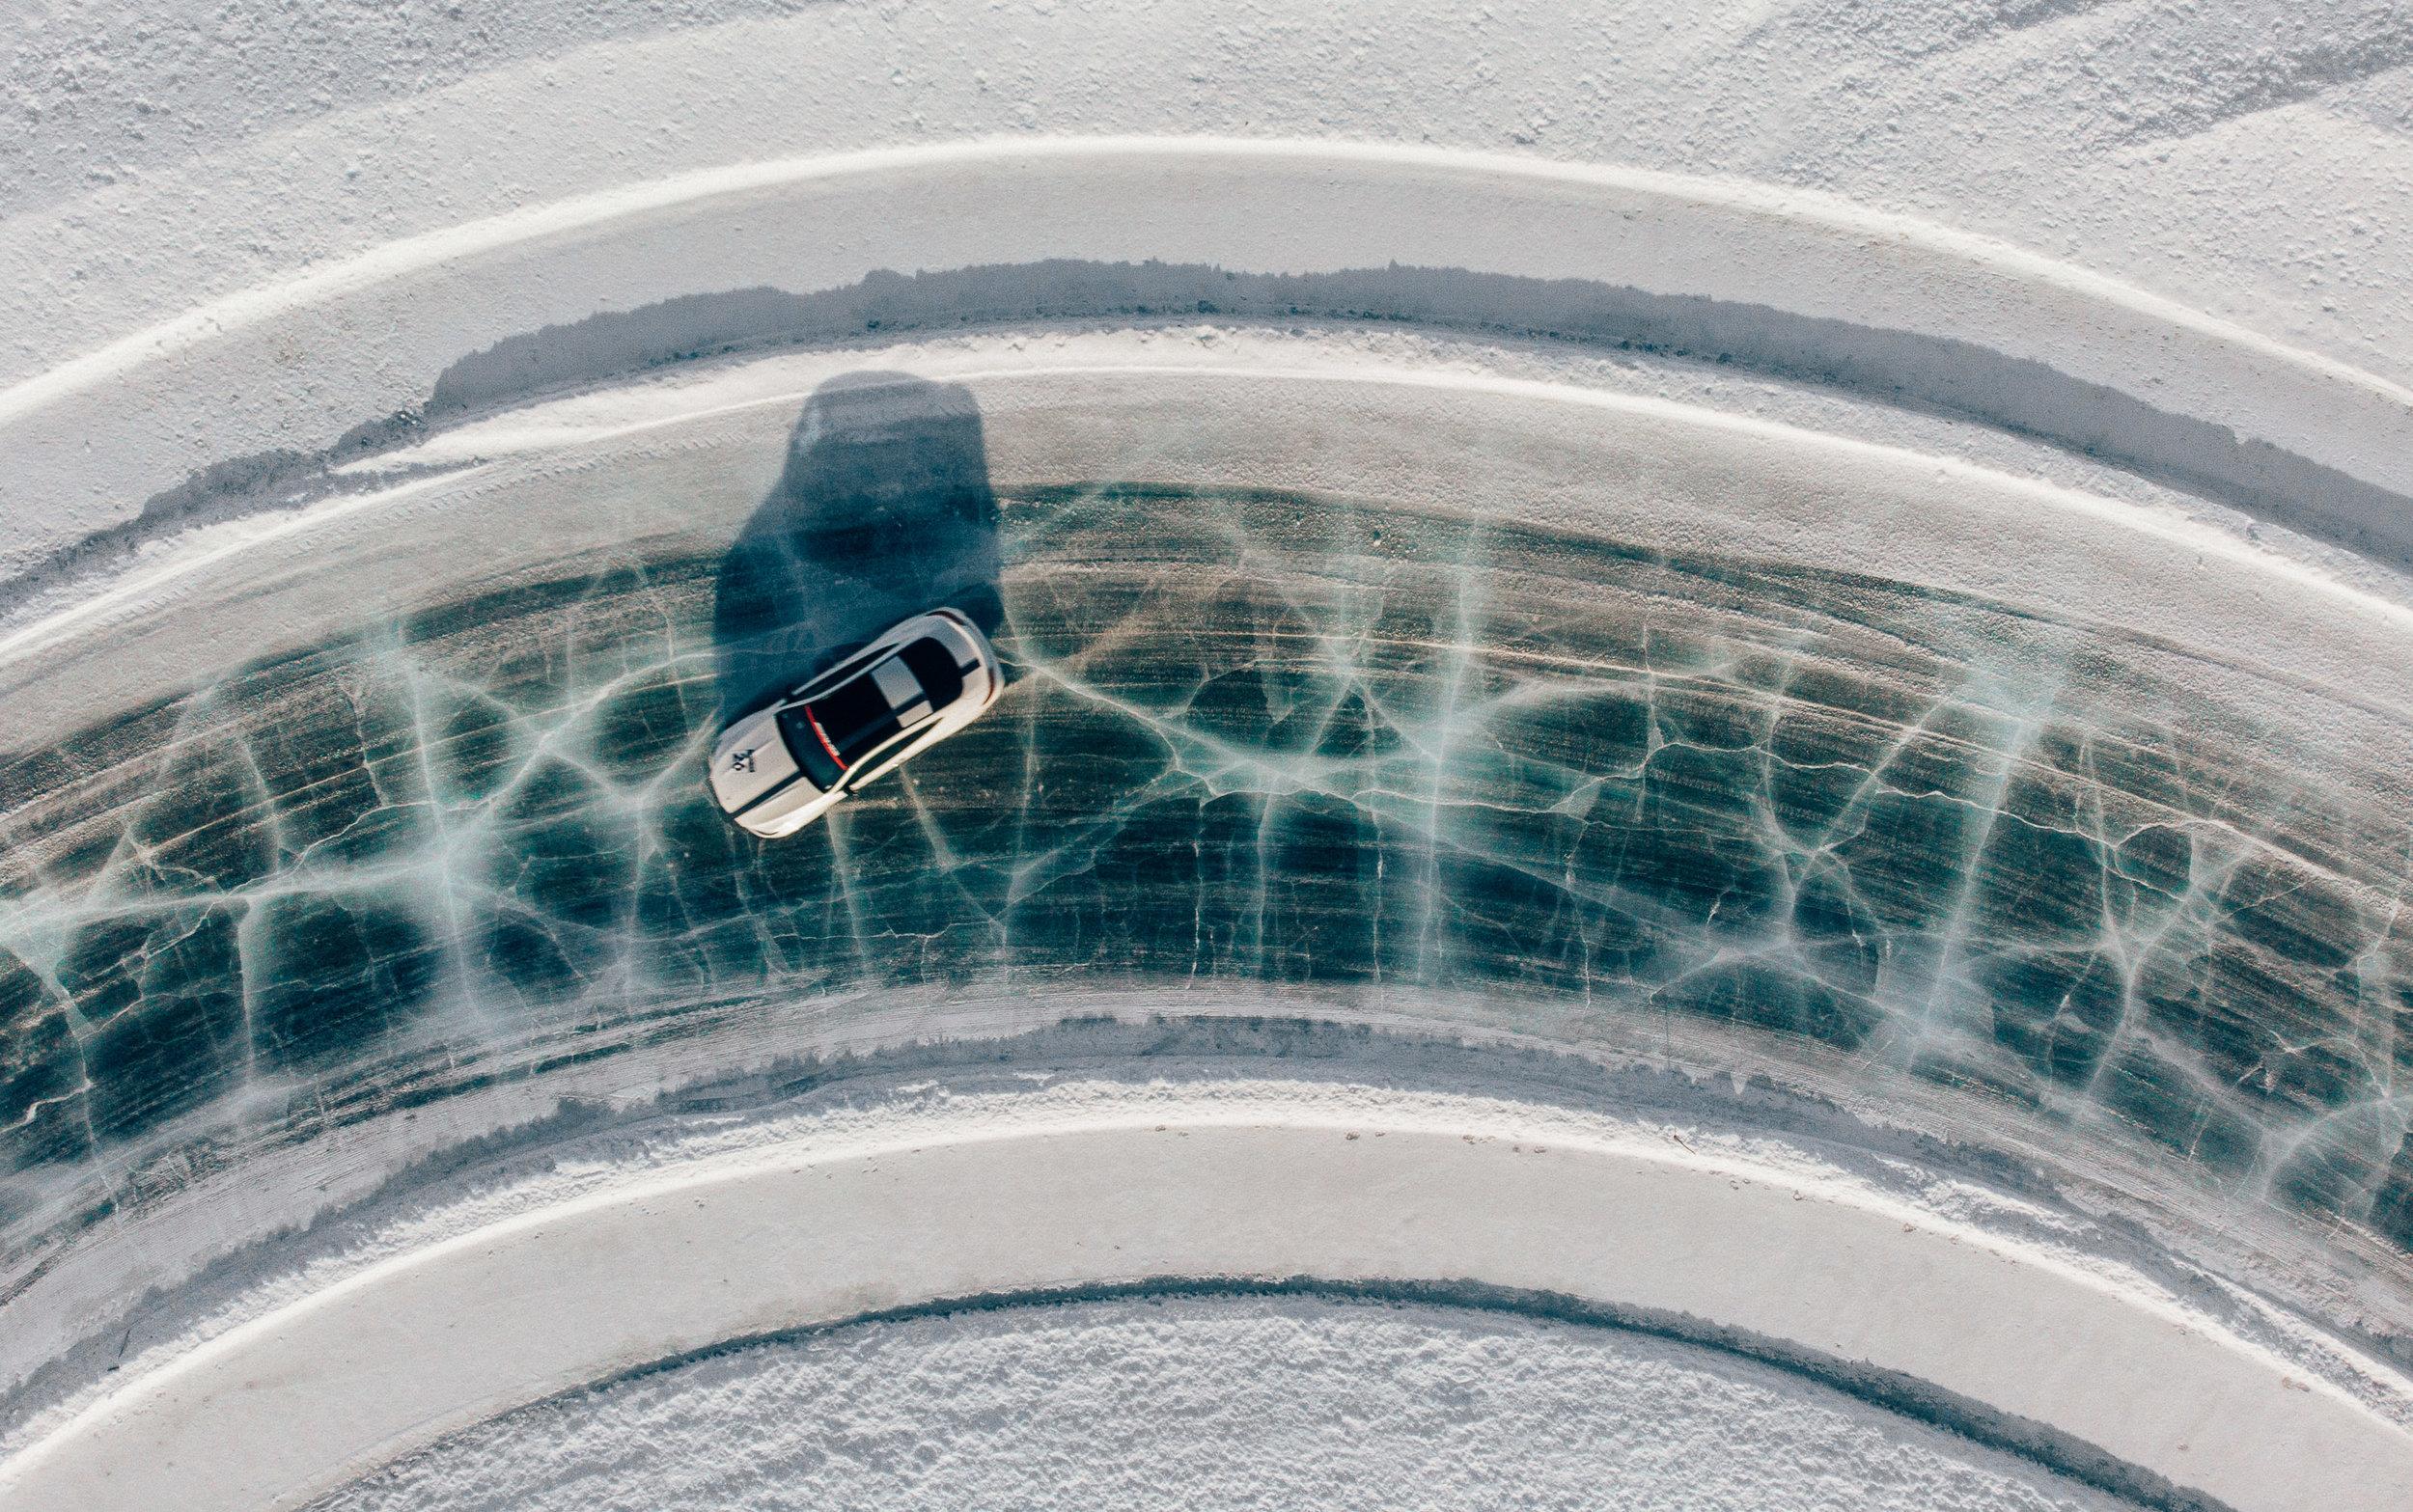 Drive_for_Good_Ice_Drive_by_Maxim_Kuijper-0528.jpg